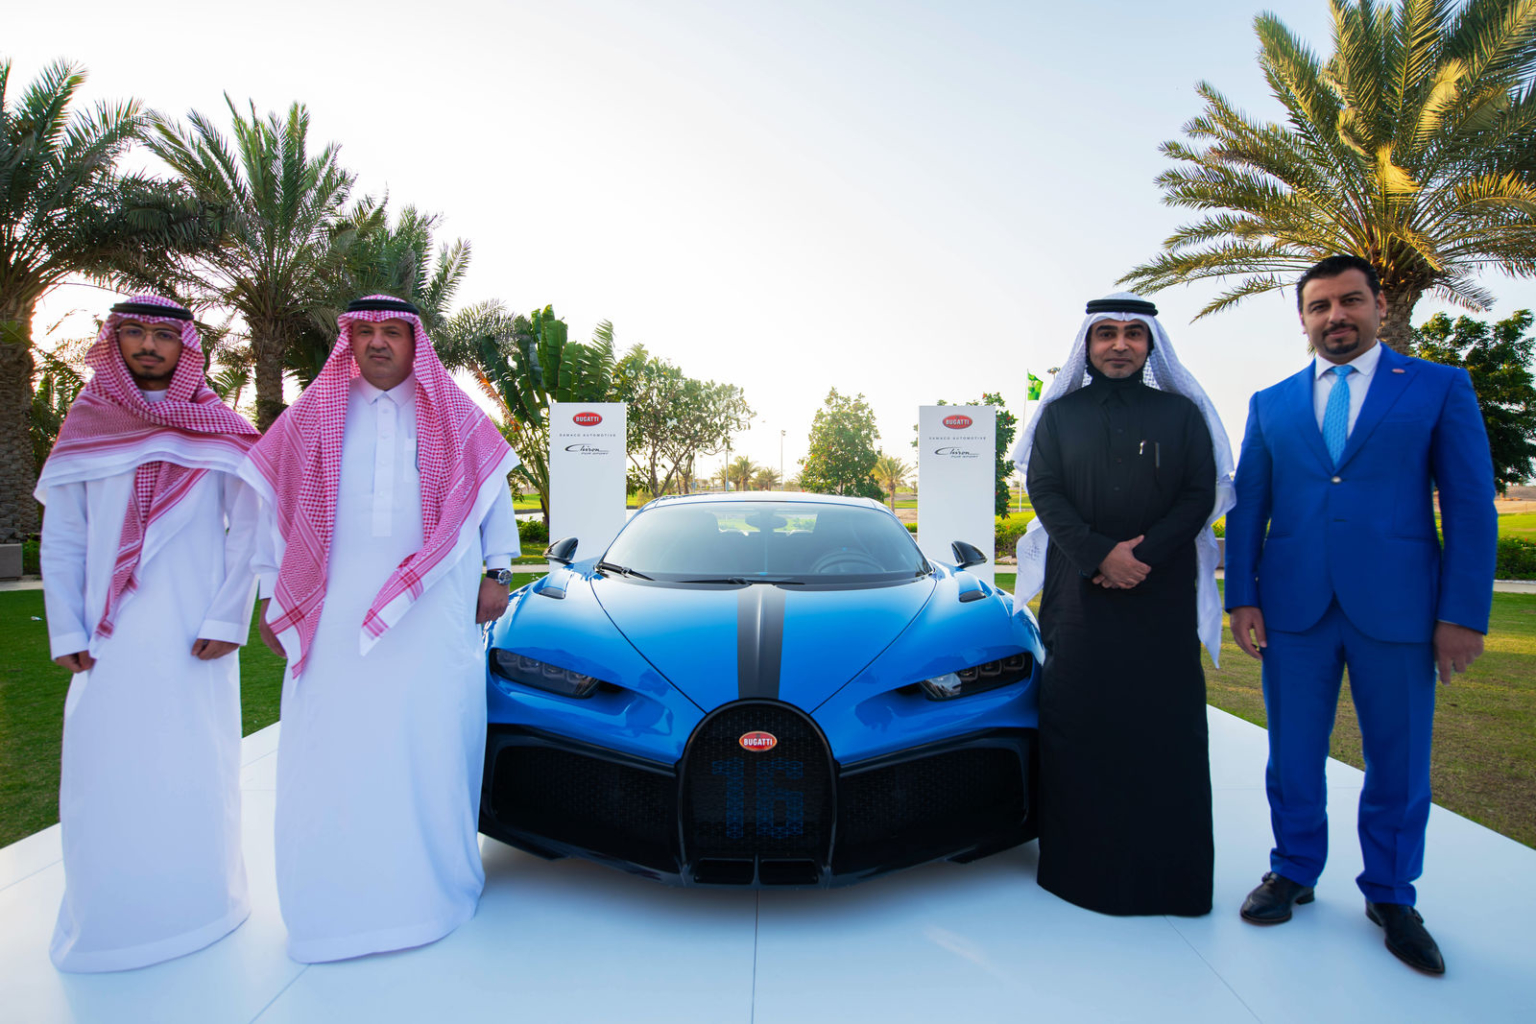 Bugatti in the Middle East new Dealer Partner in Saudi Arabia